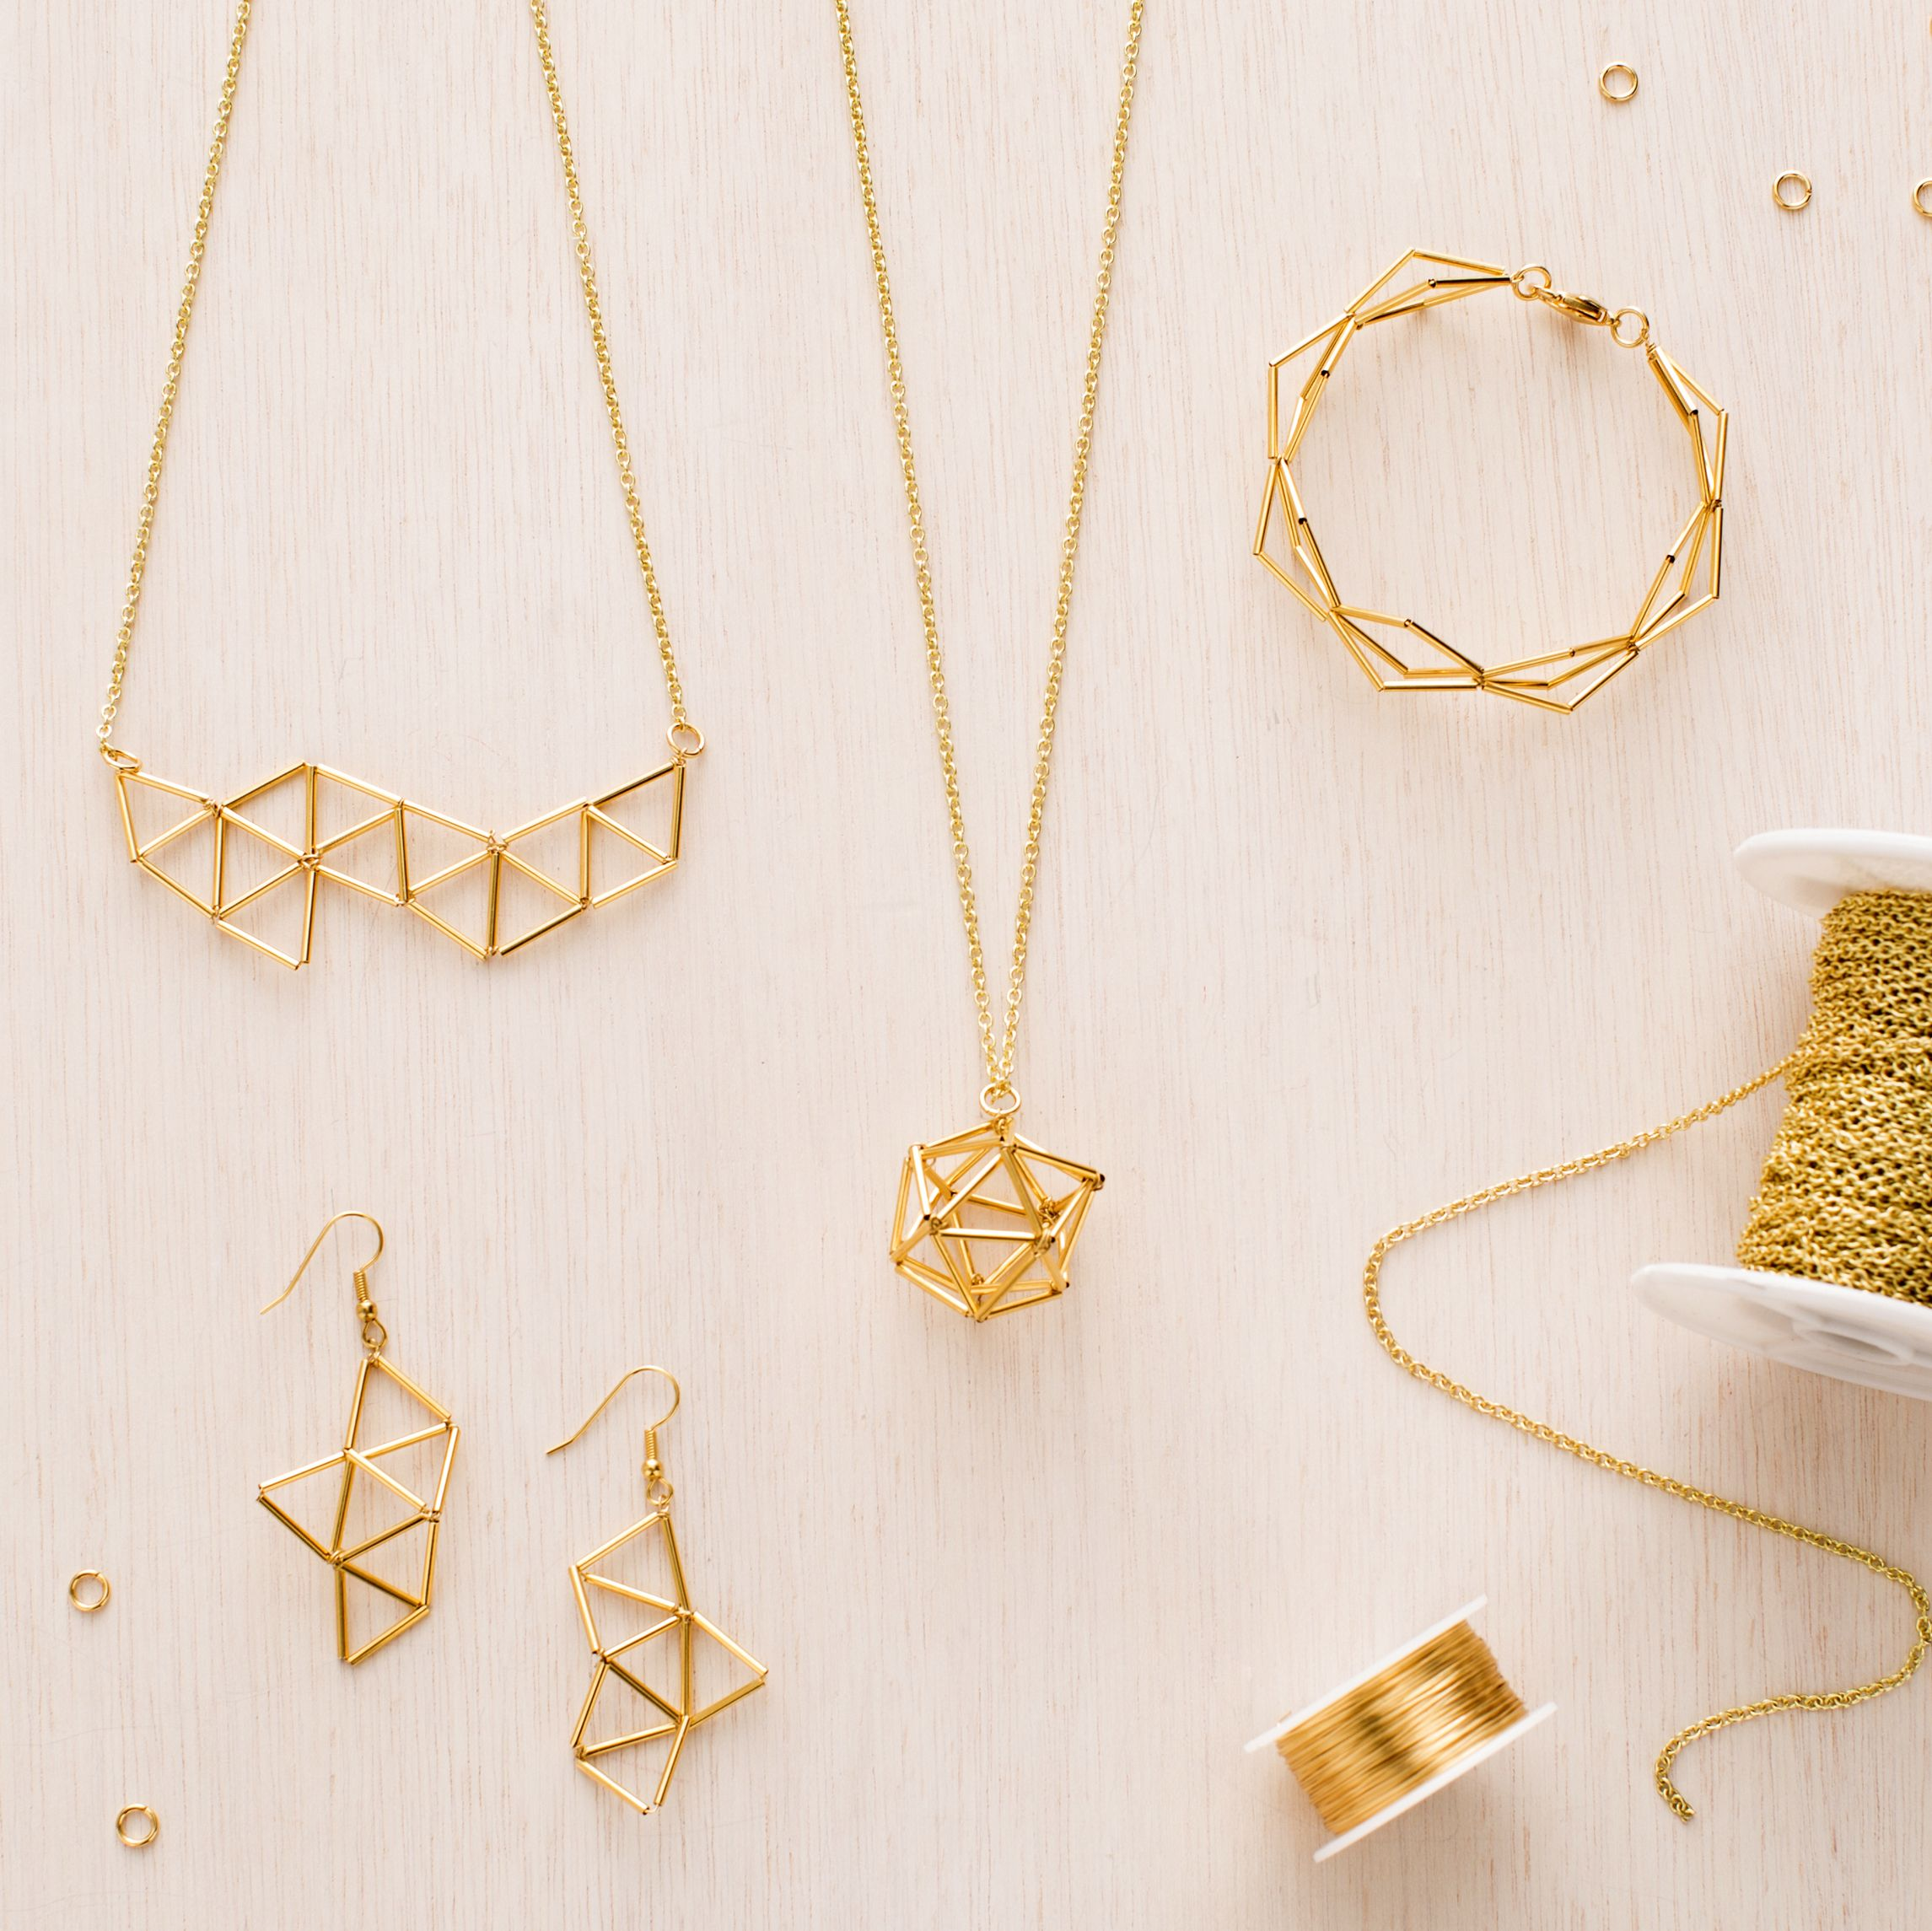 Geometric Jewelry Kit | DIY | Pinterest | Schmuck basteln ...